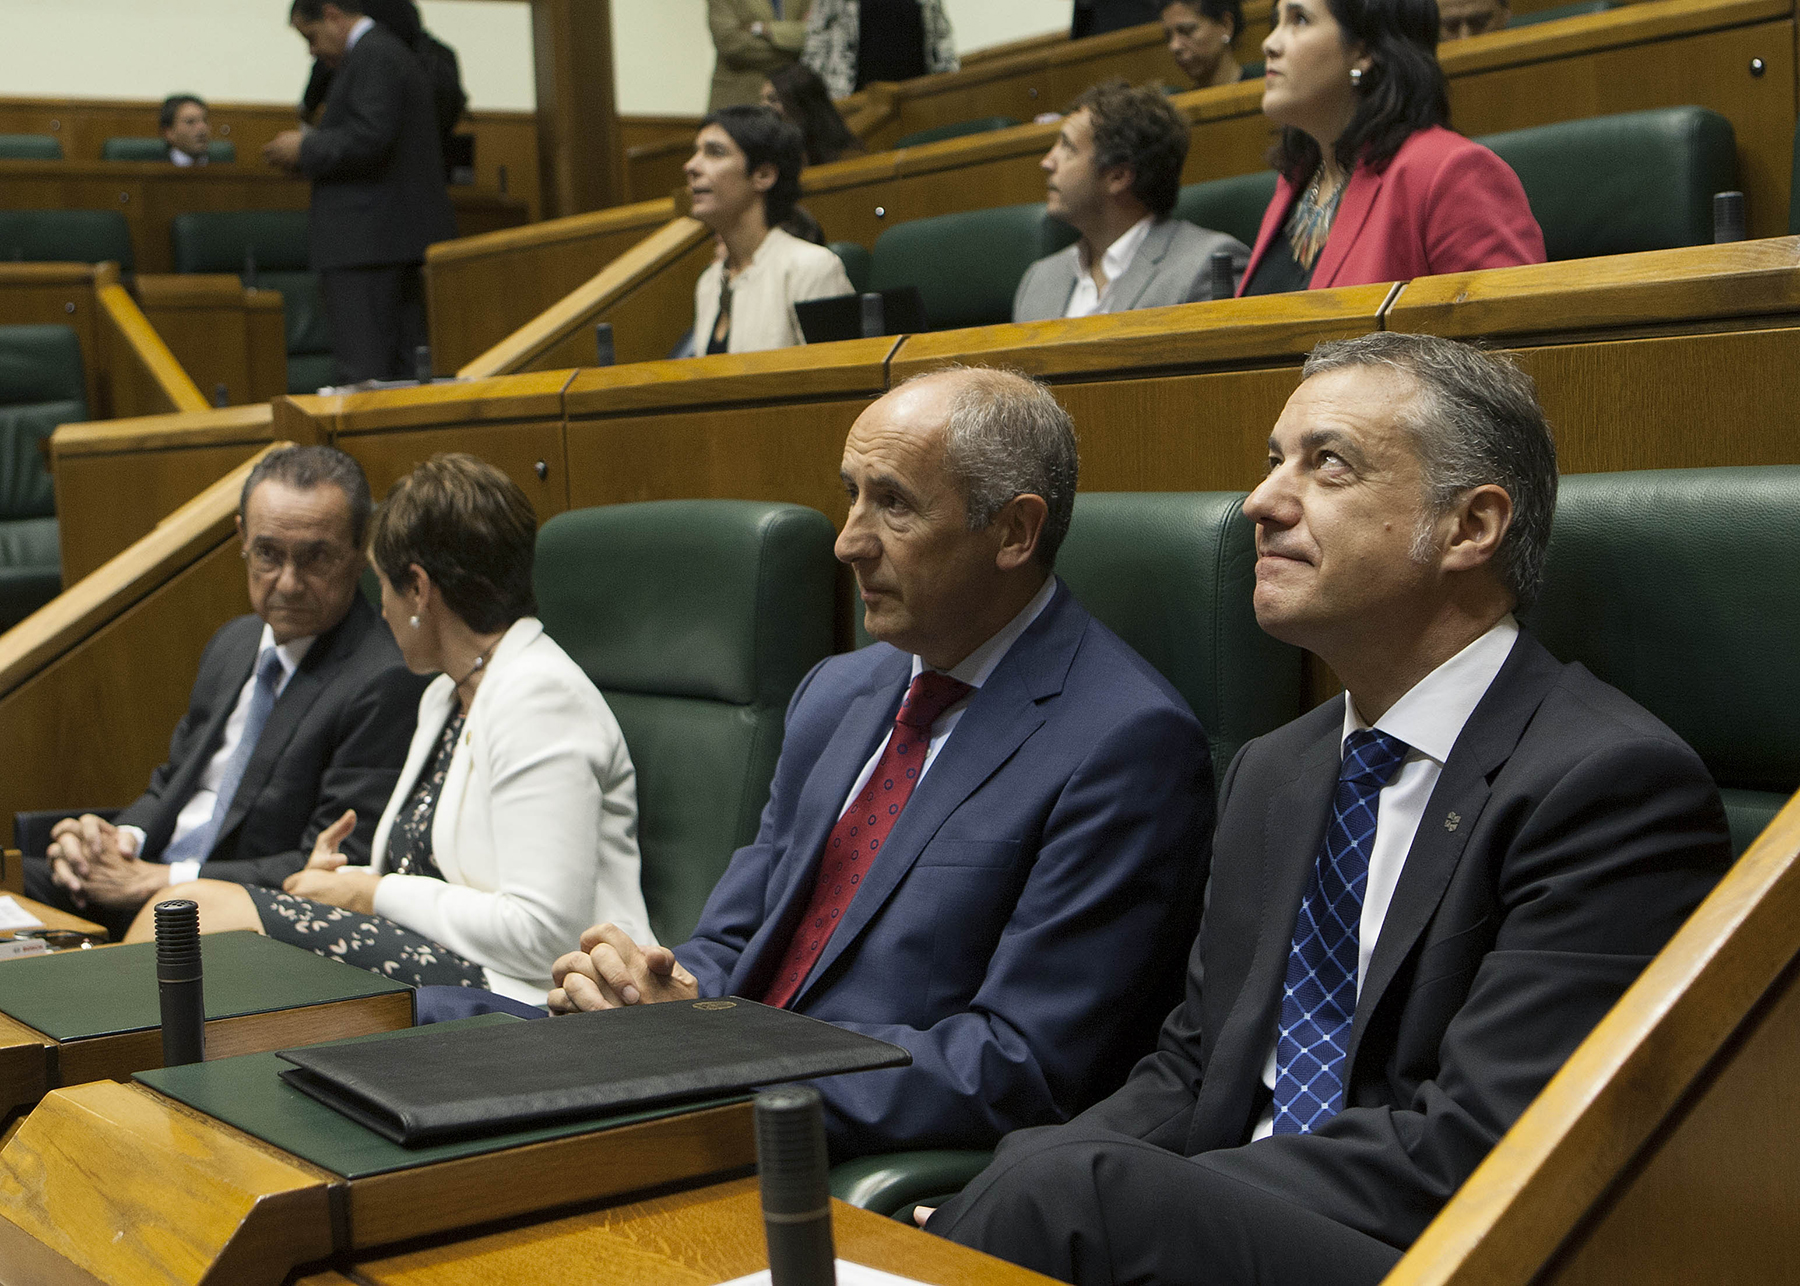 2015_09_24_lhk_parlamento_003.jpg